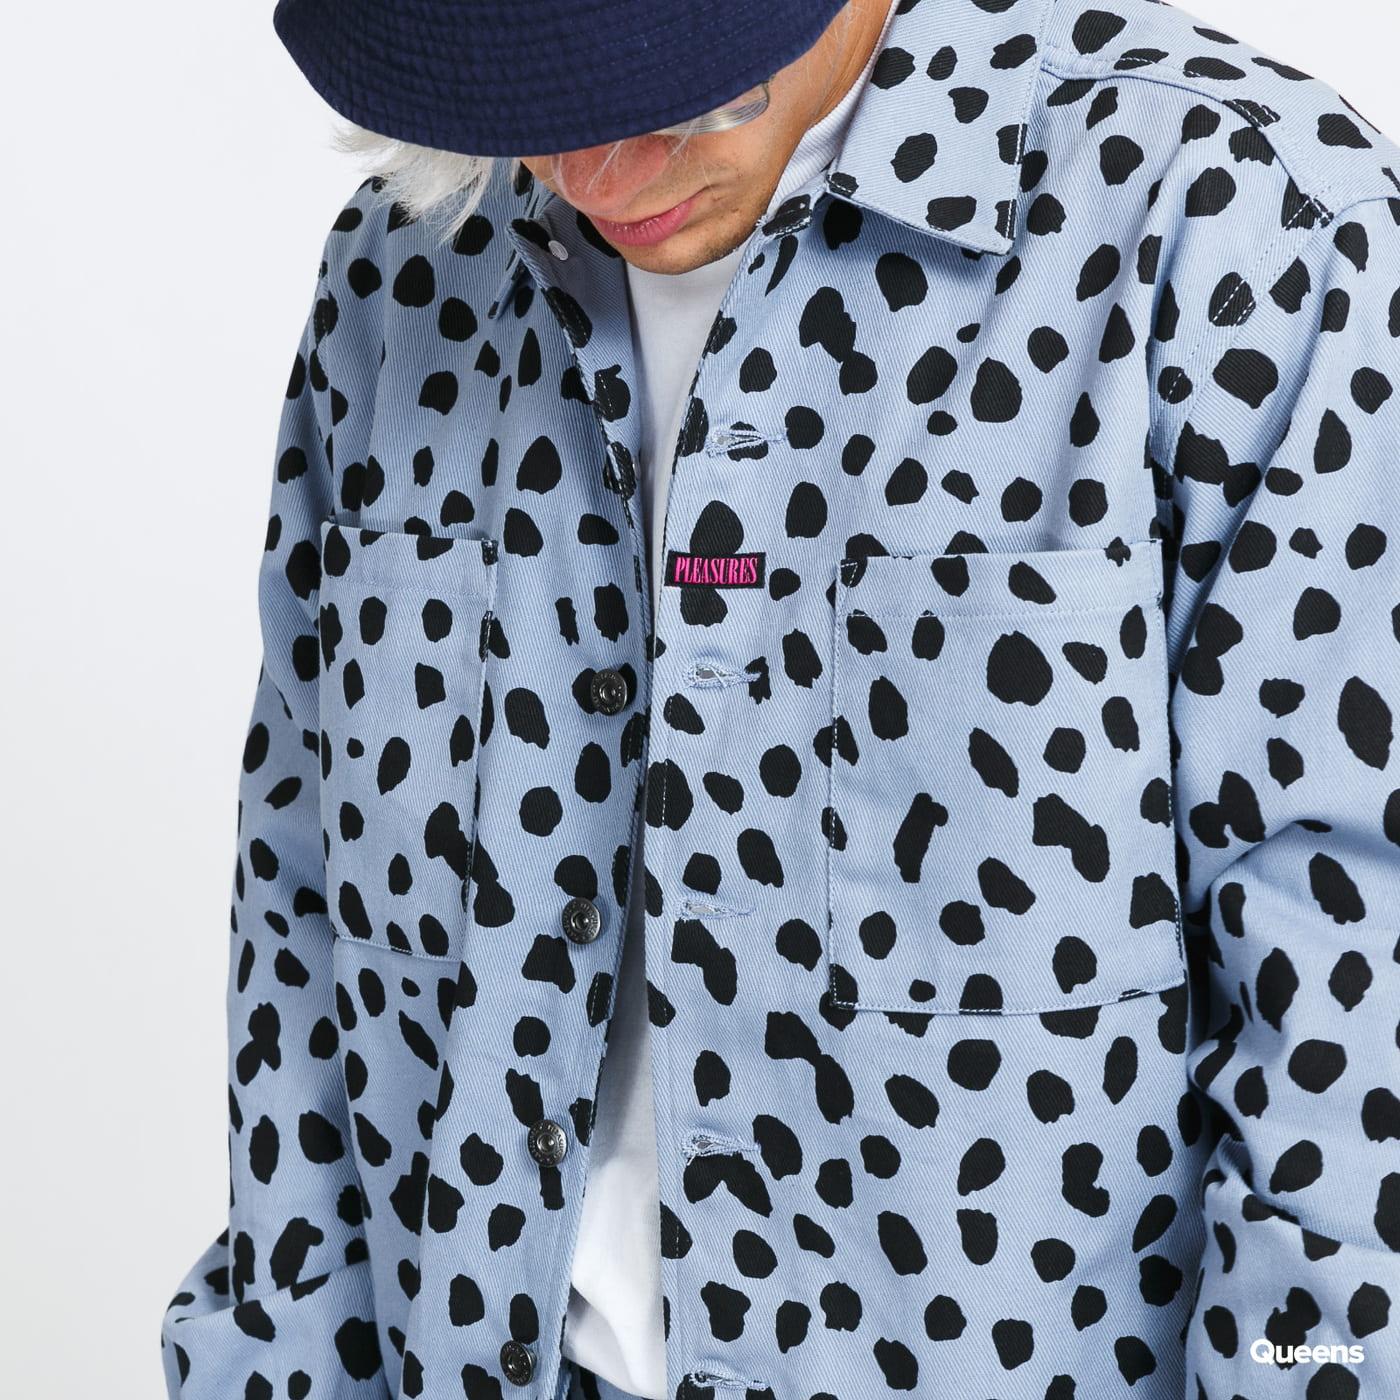 PLEASURES Dalmatian Work Jacket light blue